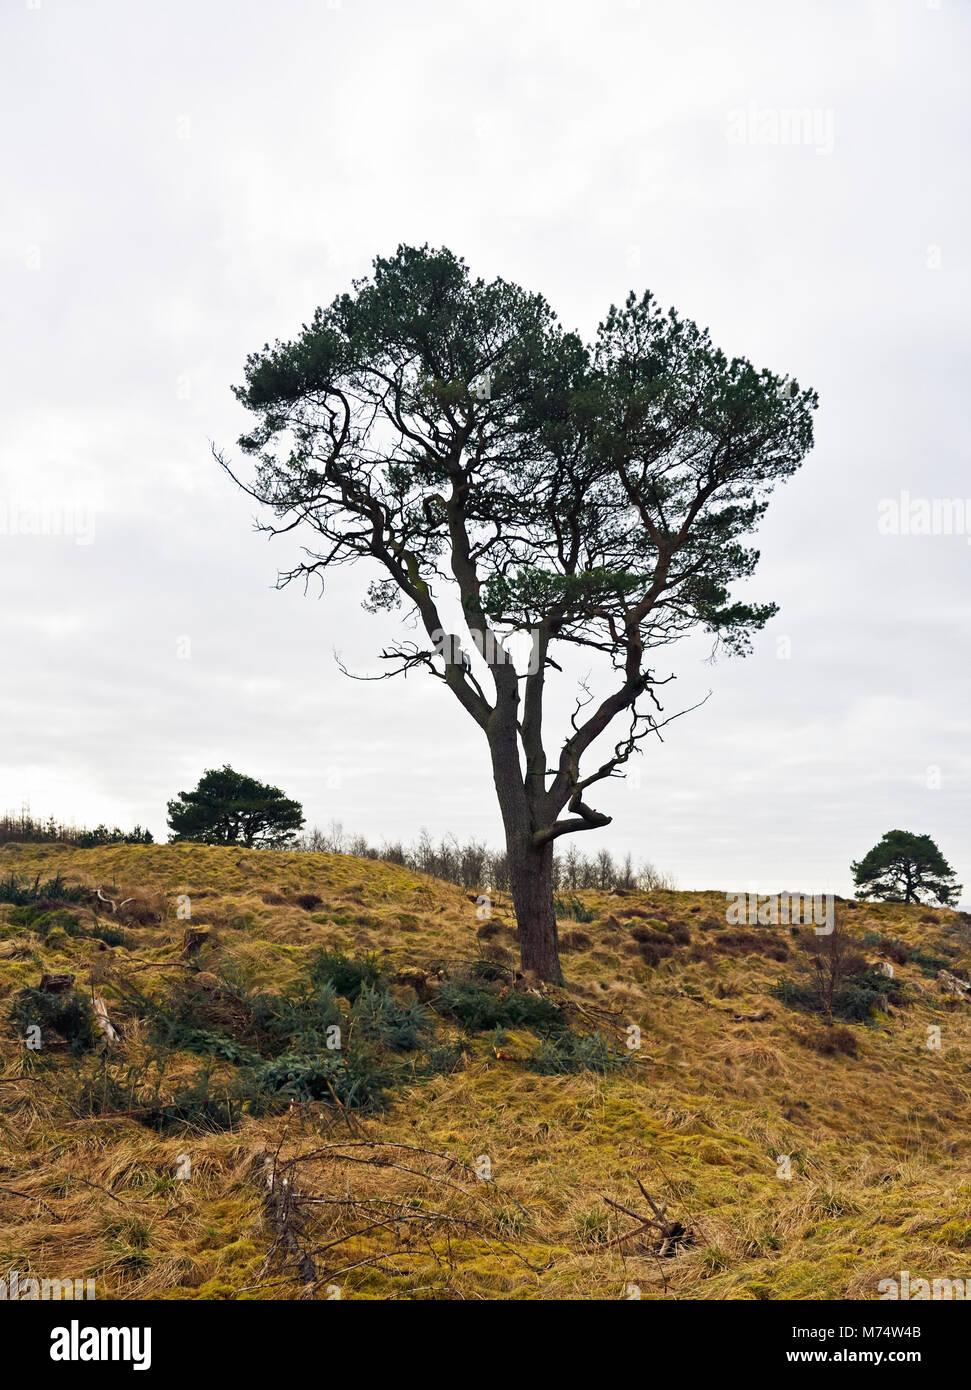 Scots Pine in winter. Wilsontown, Forth, Lanarkshire, Scotland, United Kingdom, Europe - Stock Image